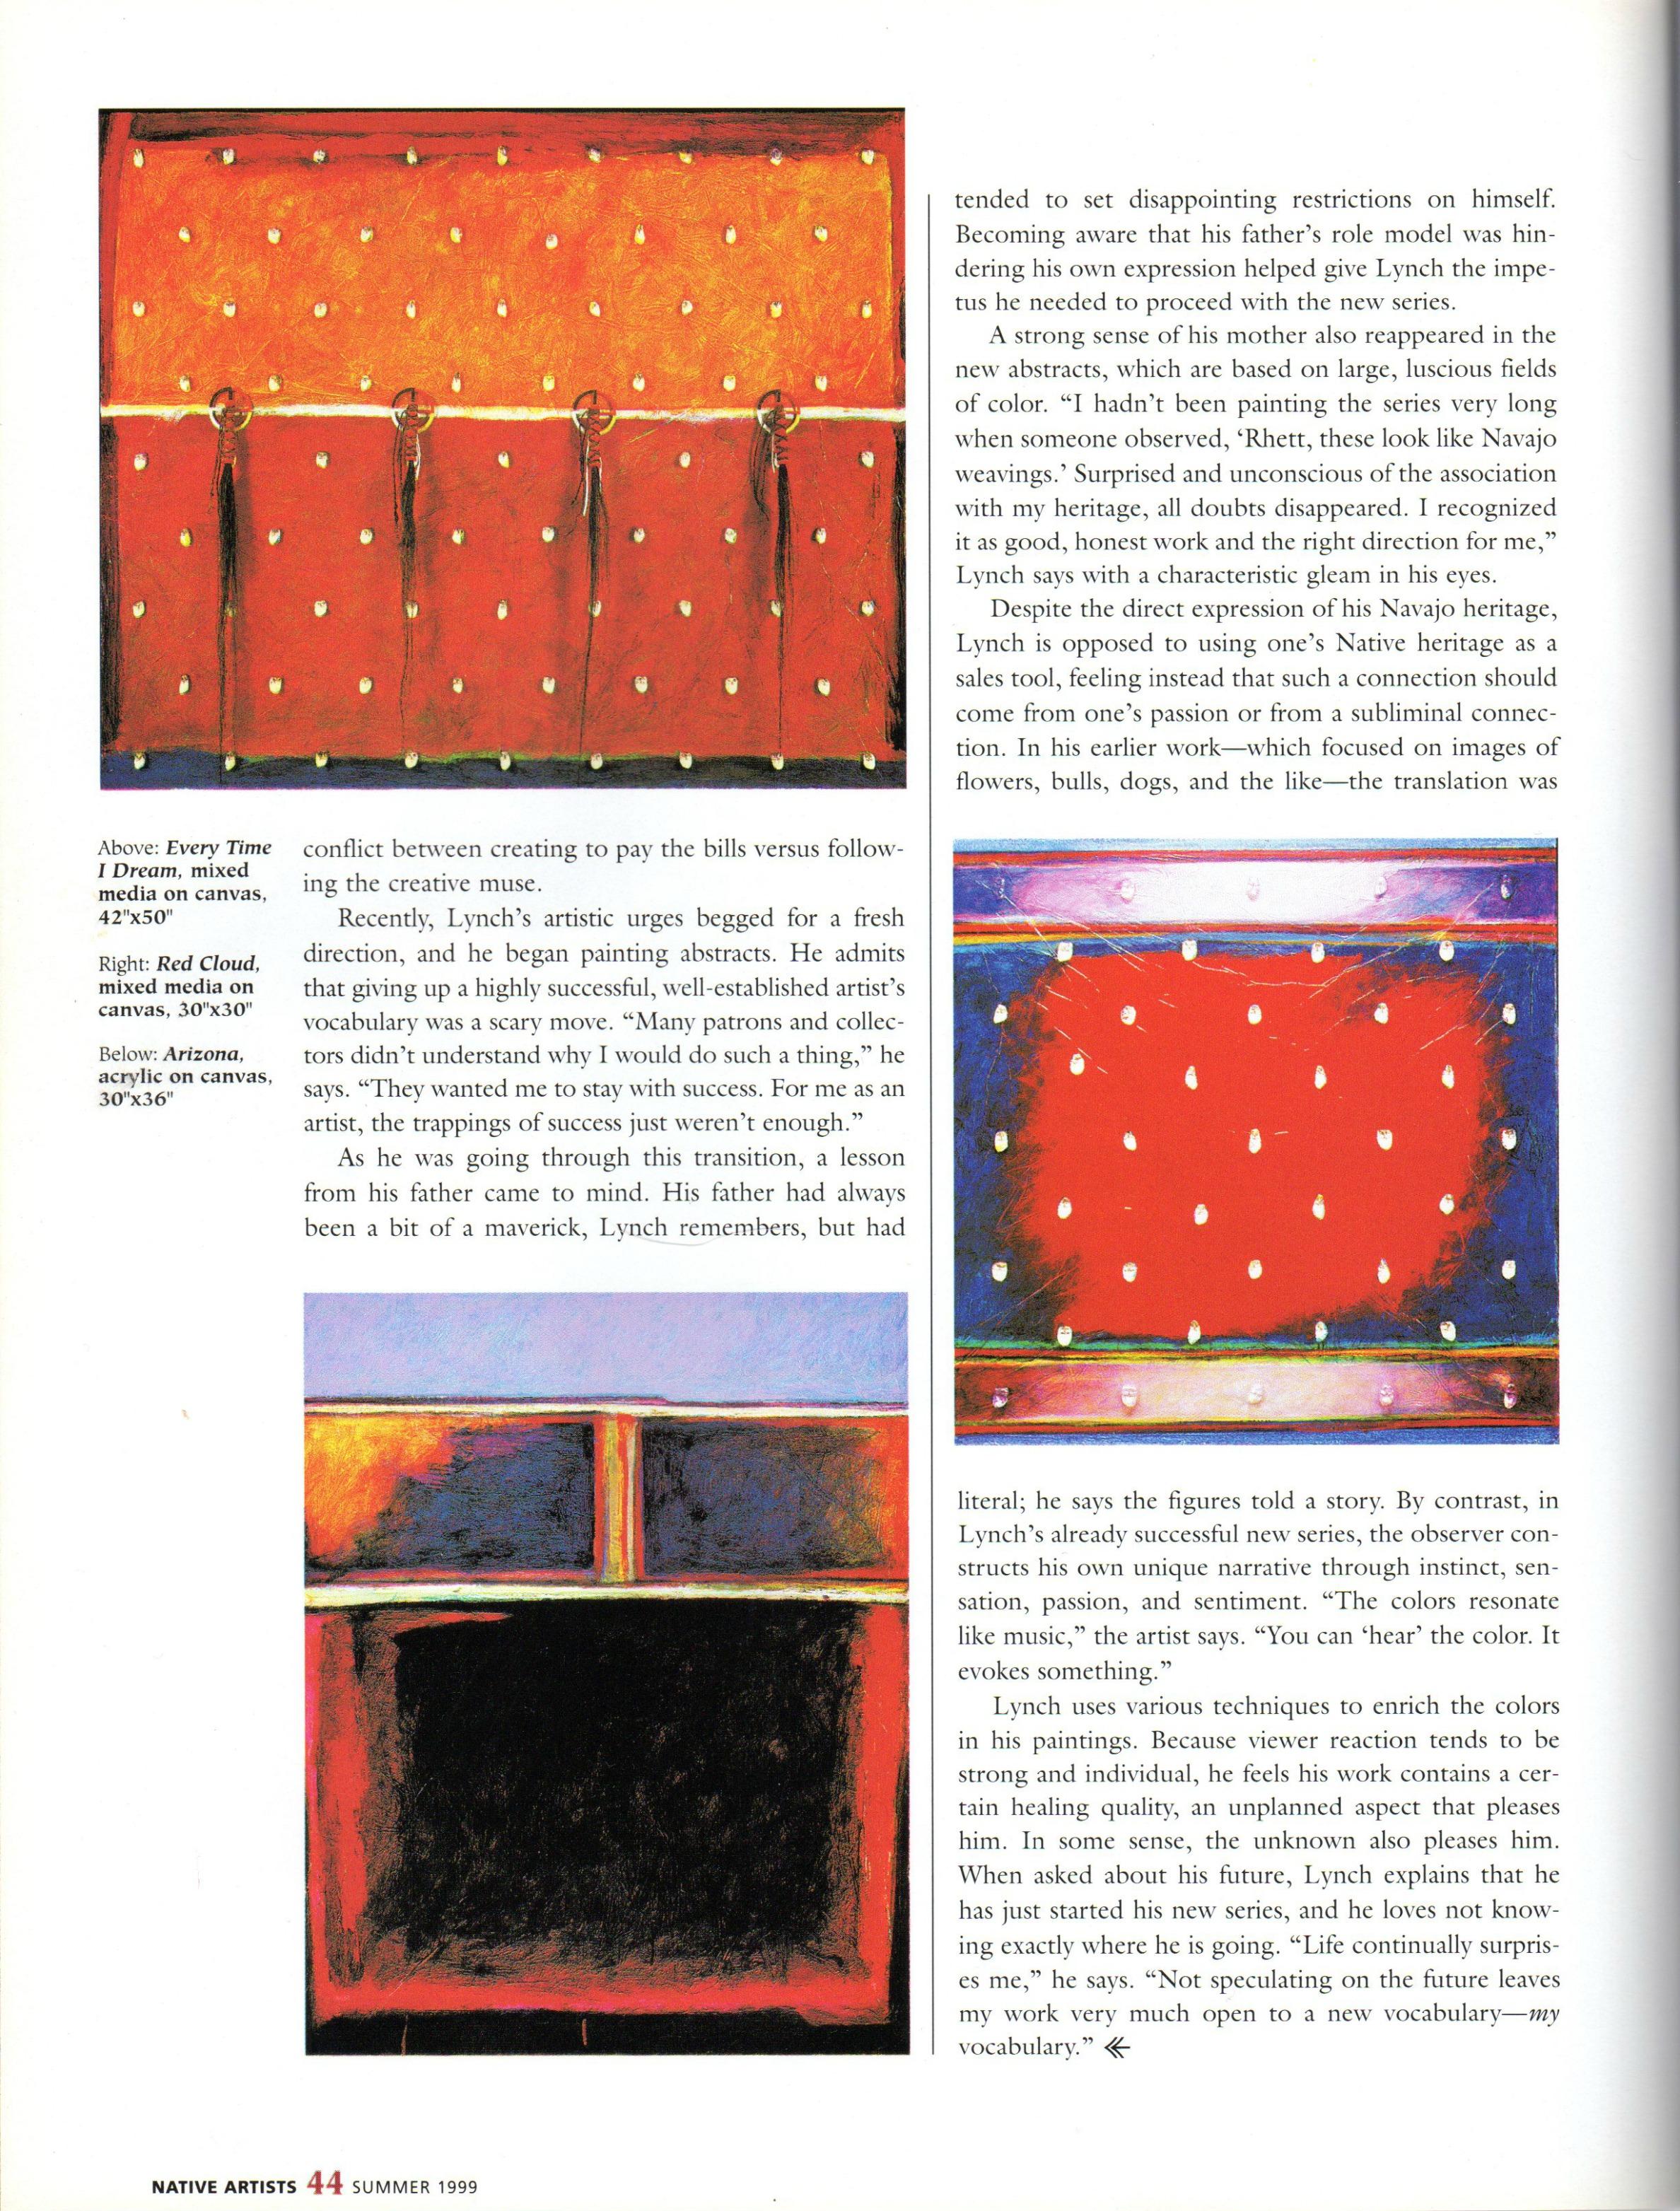 Native Artist Summer 1999 p.44..jpg